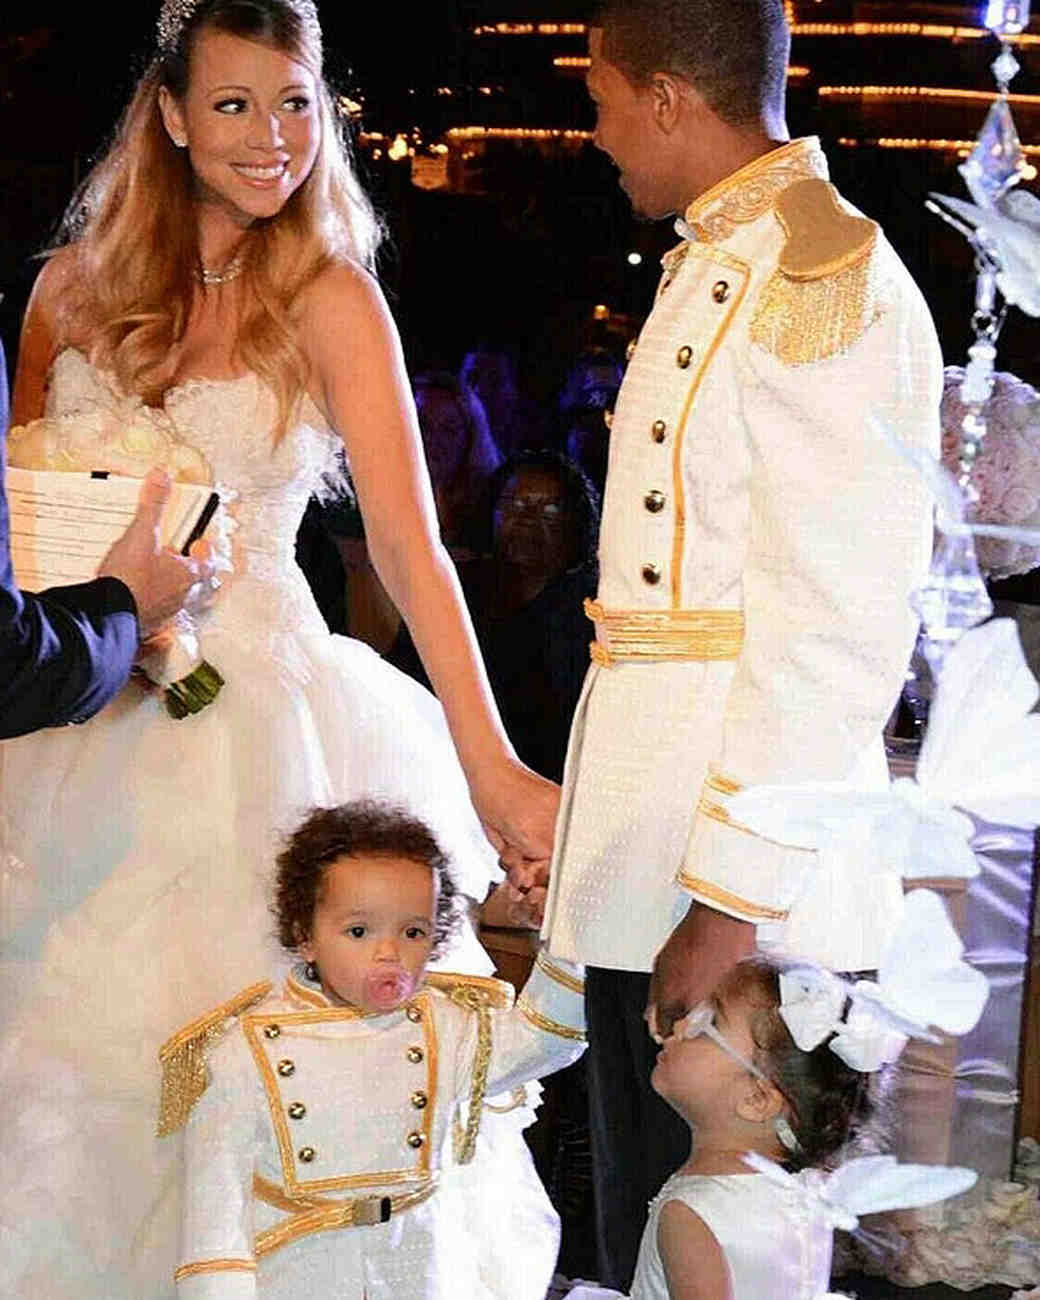 monroe-moroccan-mariah-carey-nick-cannon-celebrity-kids-weddings.jpg